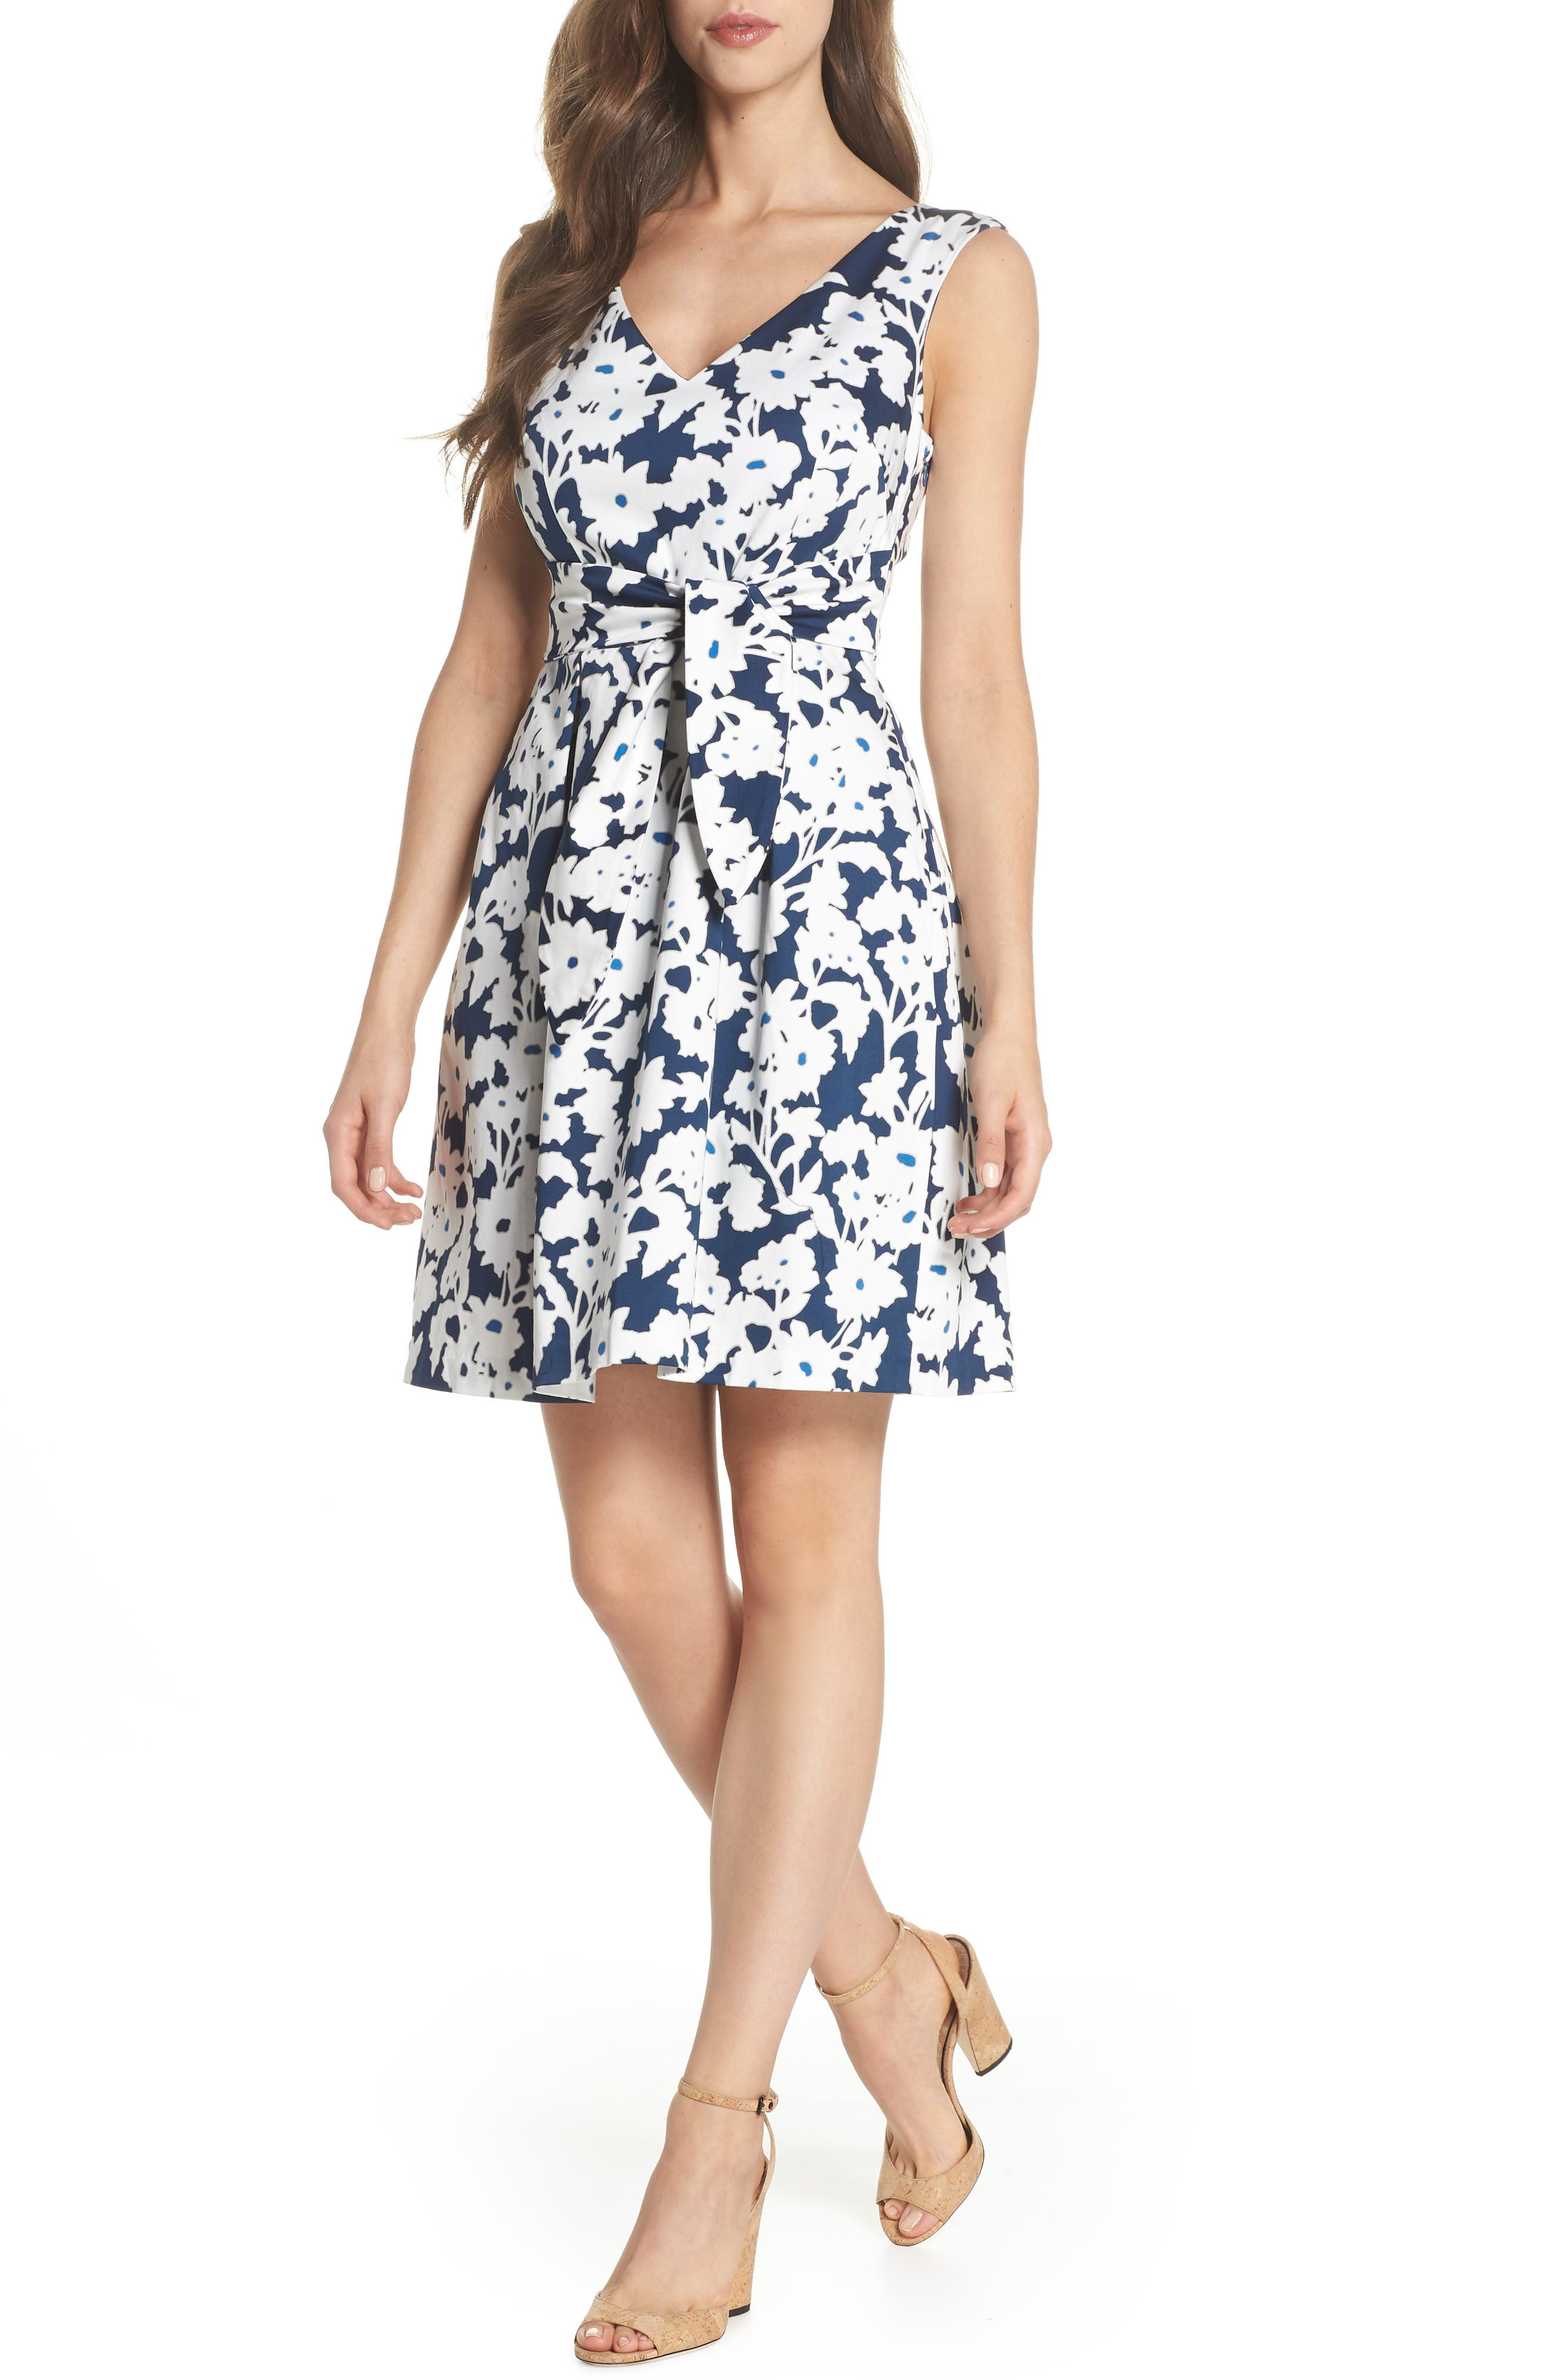 Adrianna Papell Daisy Field Fit & Flare Dress